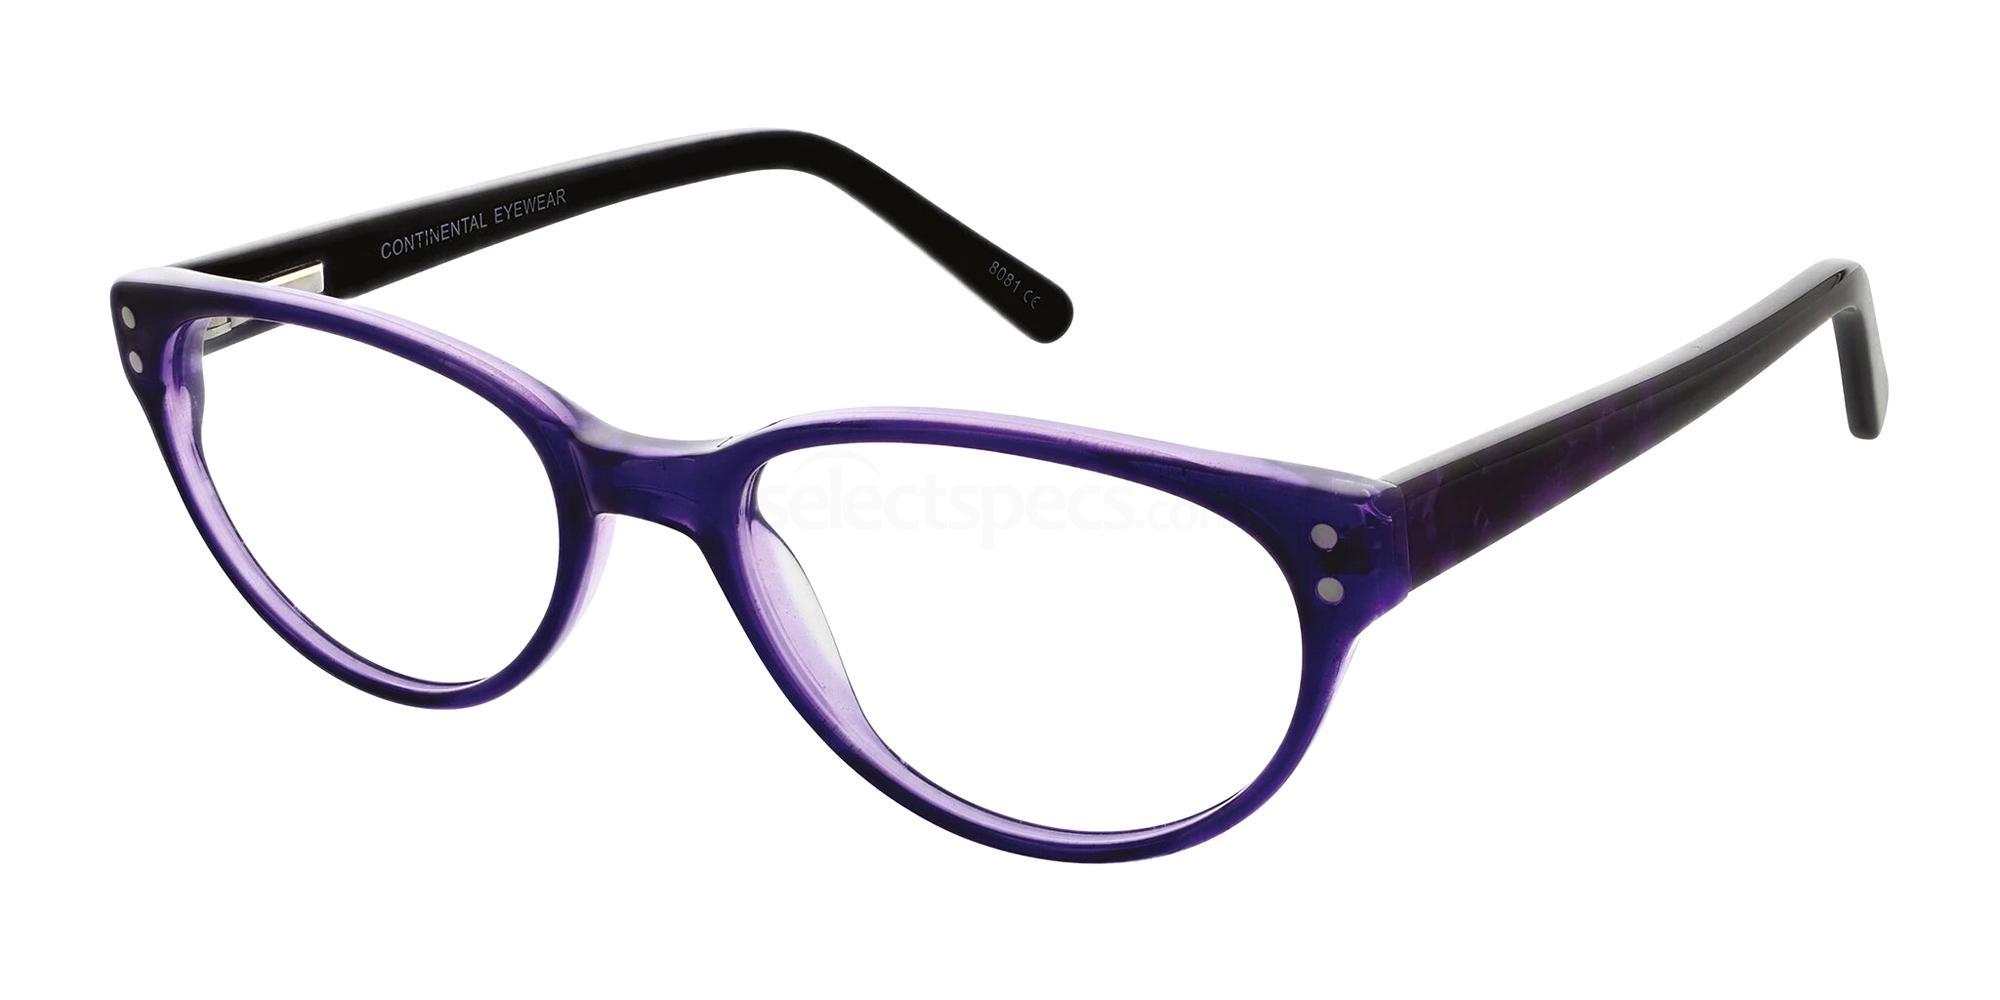 Purple 80 Glasses, Zenith Zest